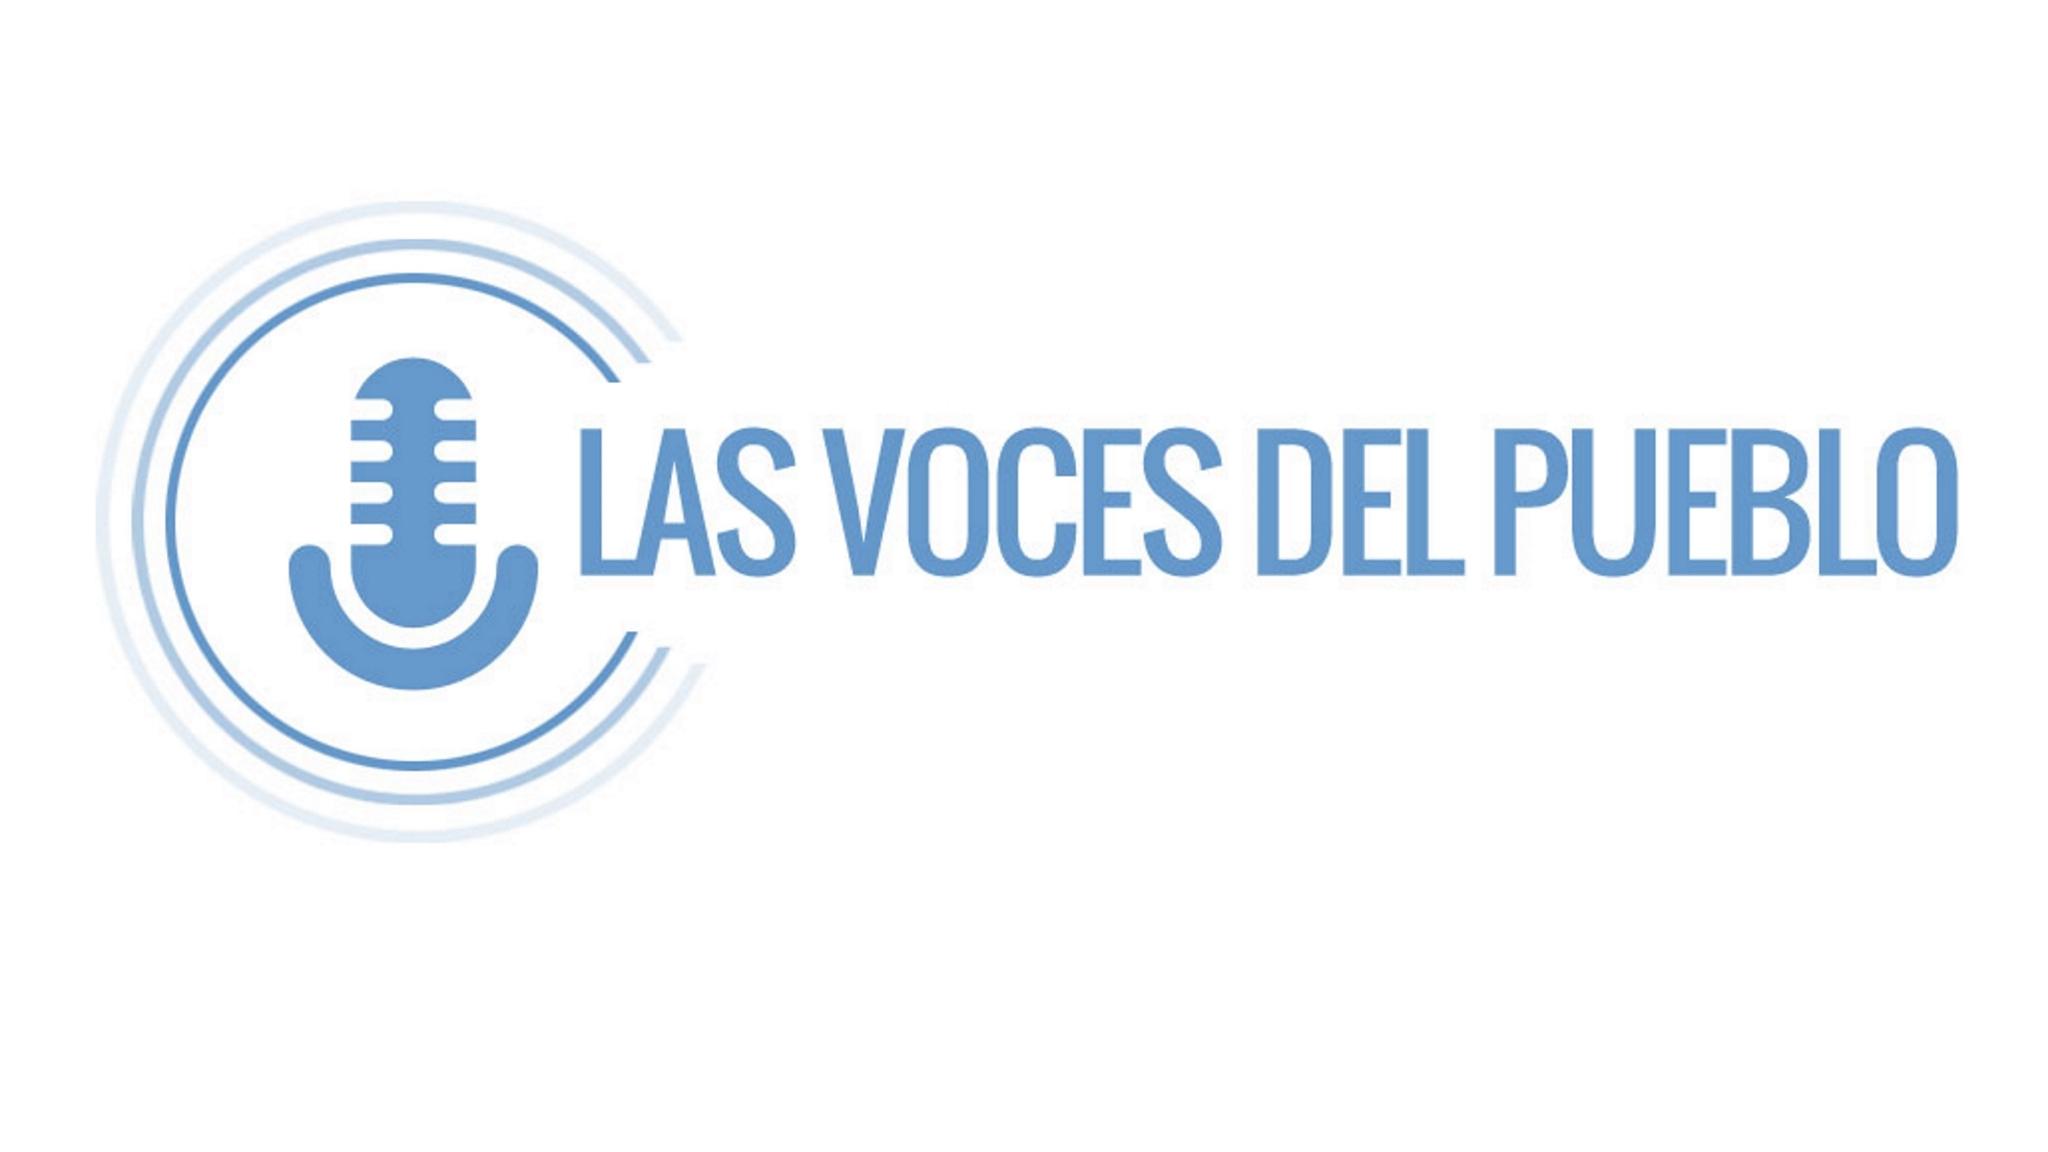 https://www.lasvocesdelpueblo.com/